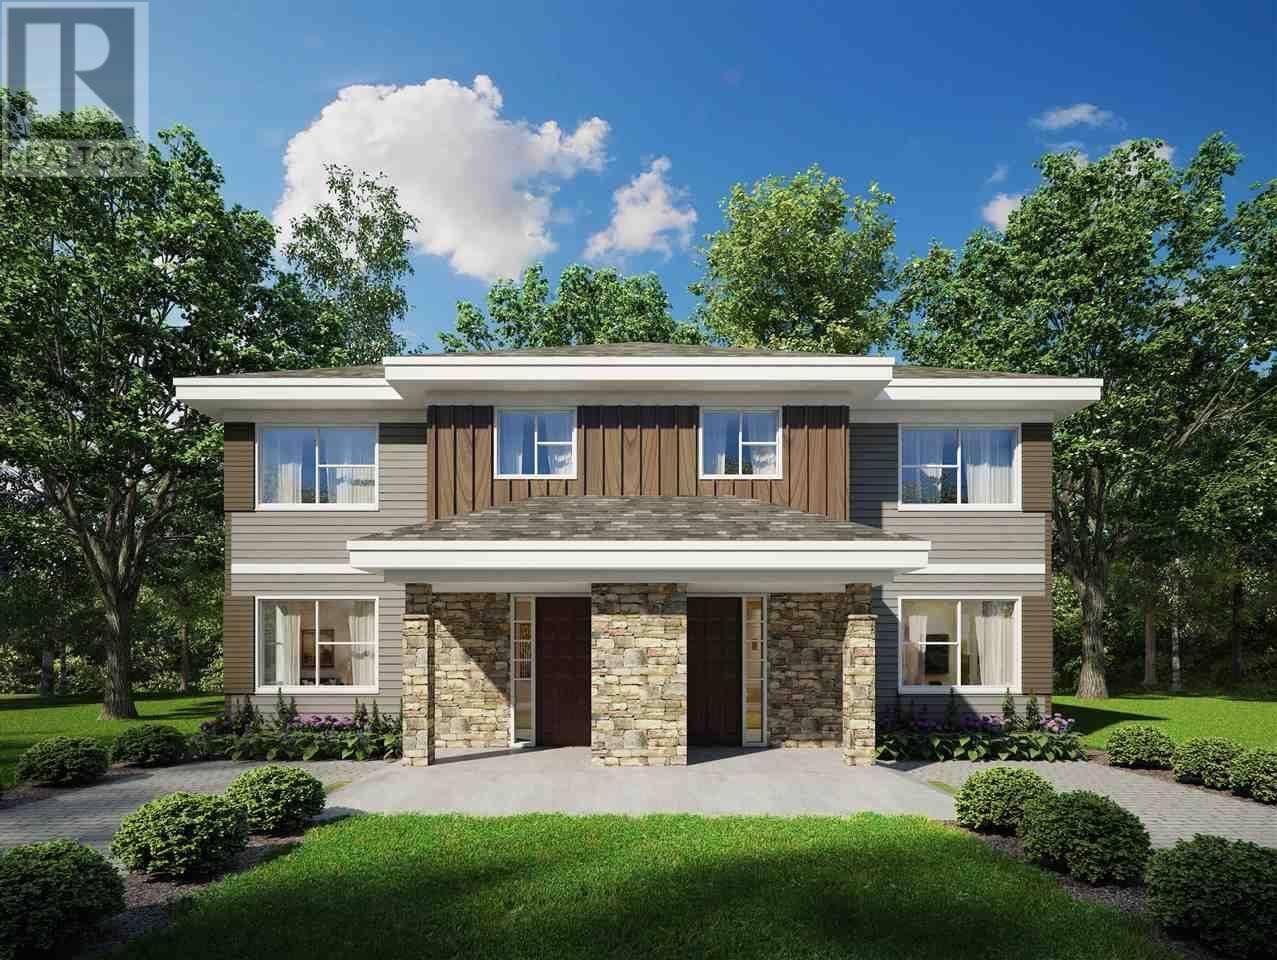 House for sale at 766 Herring Cove Rd Unit A Herring Cove Nova Scotia - MLS: 201919224